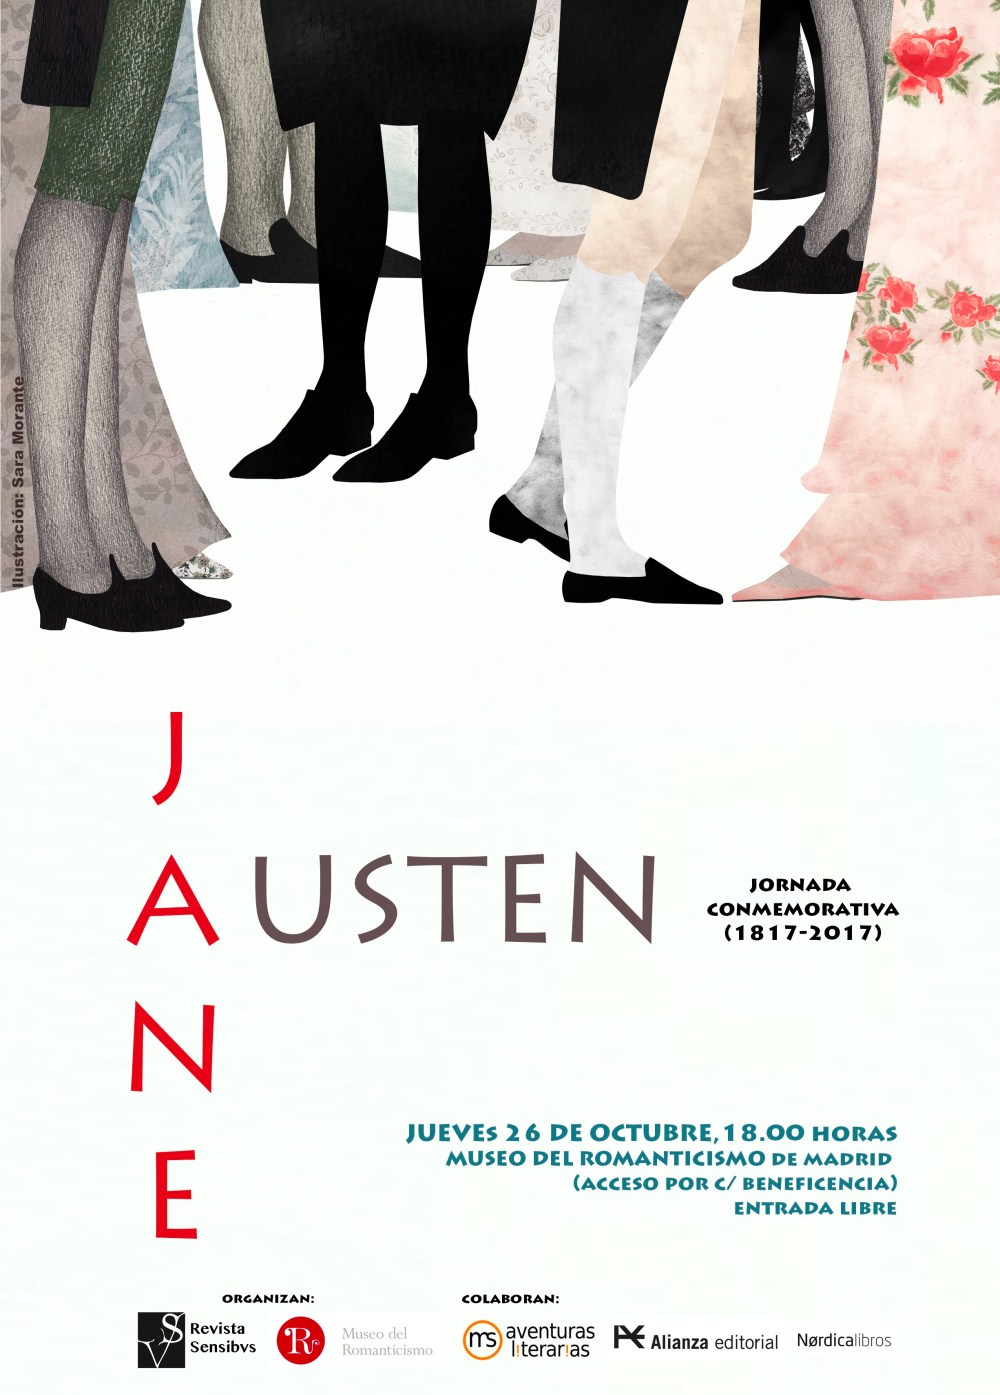 cartel-jane-austen-marcas-corte1-e1508500025873